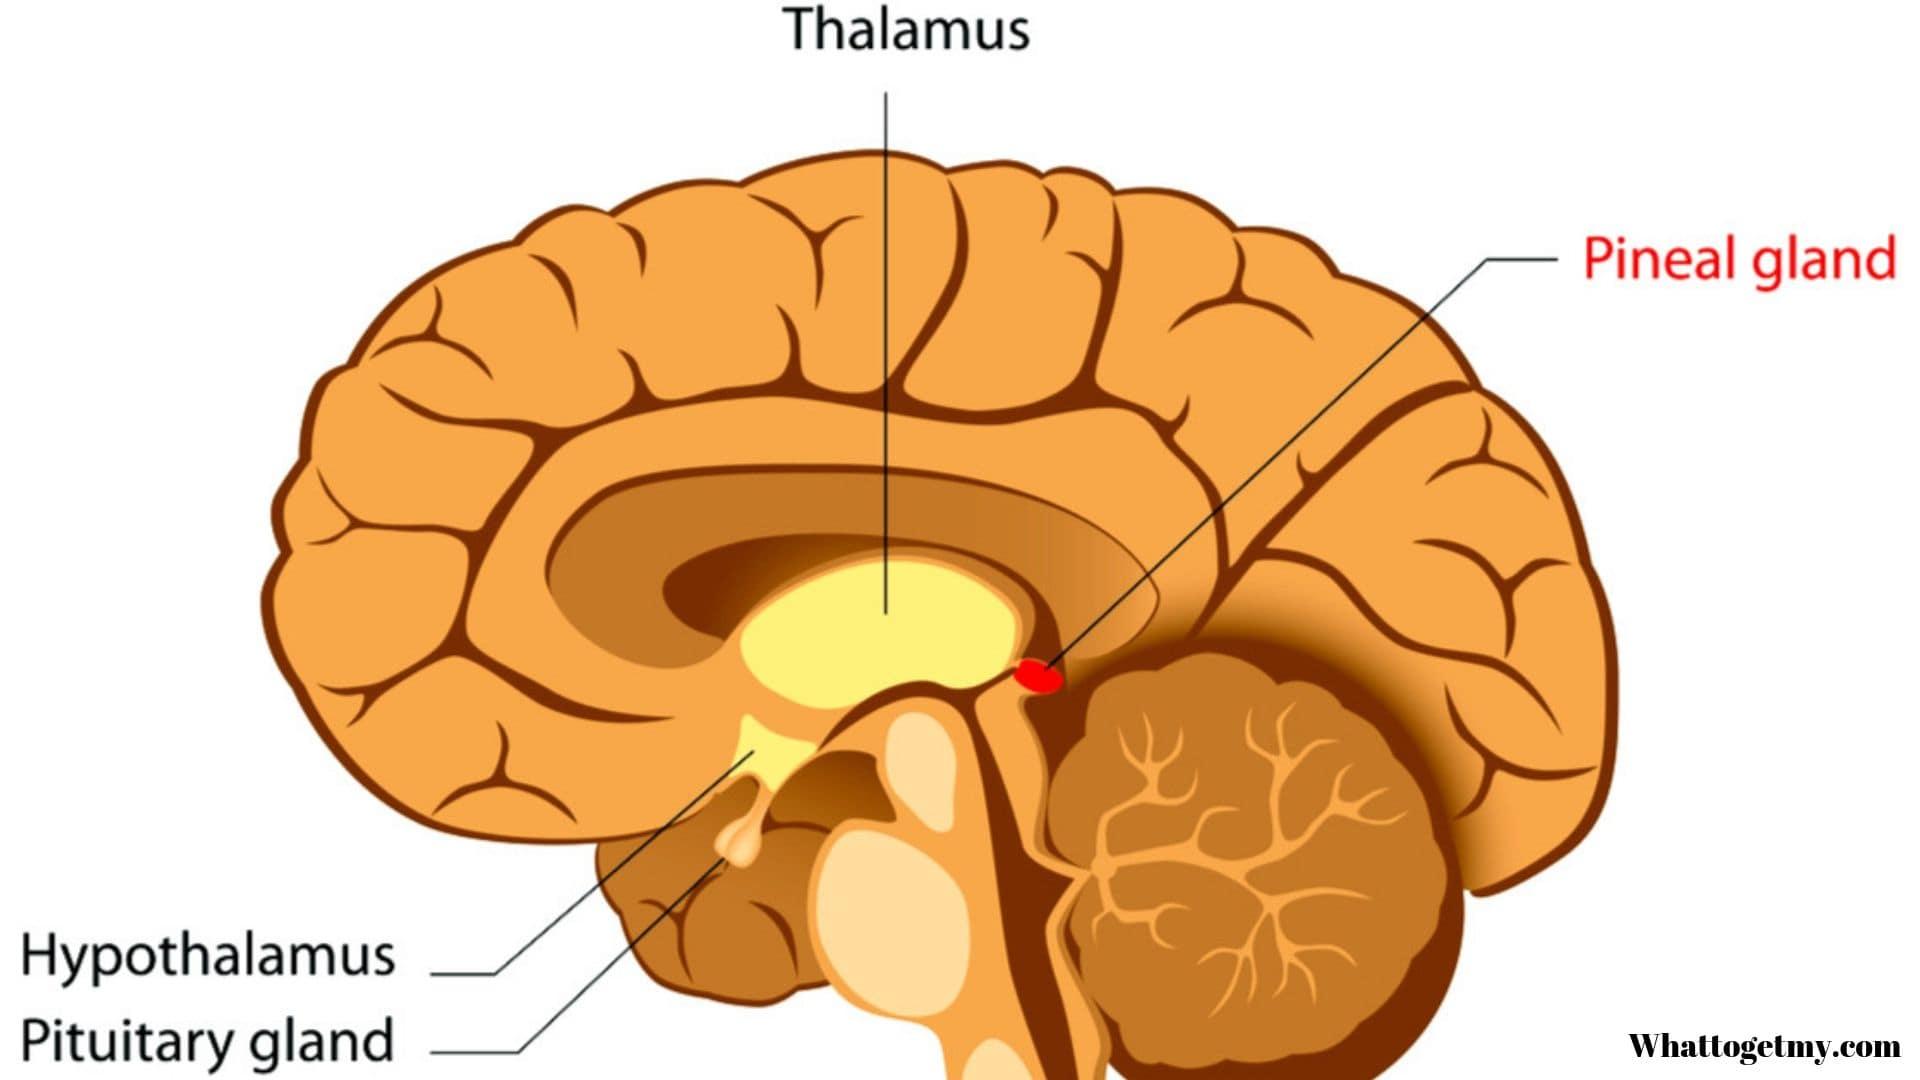 The pineal gland produces sleep hormones